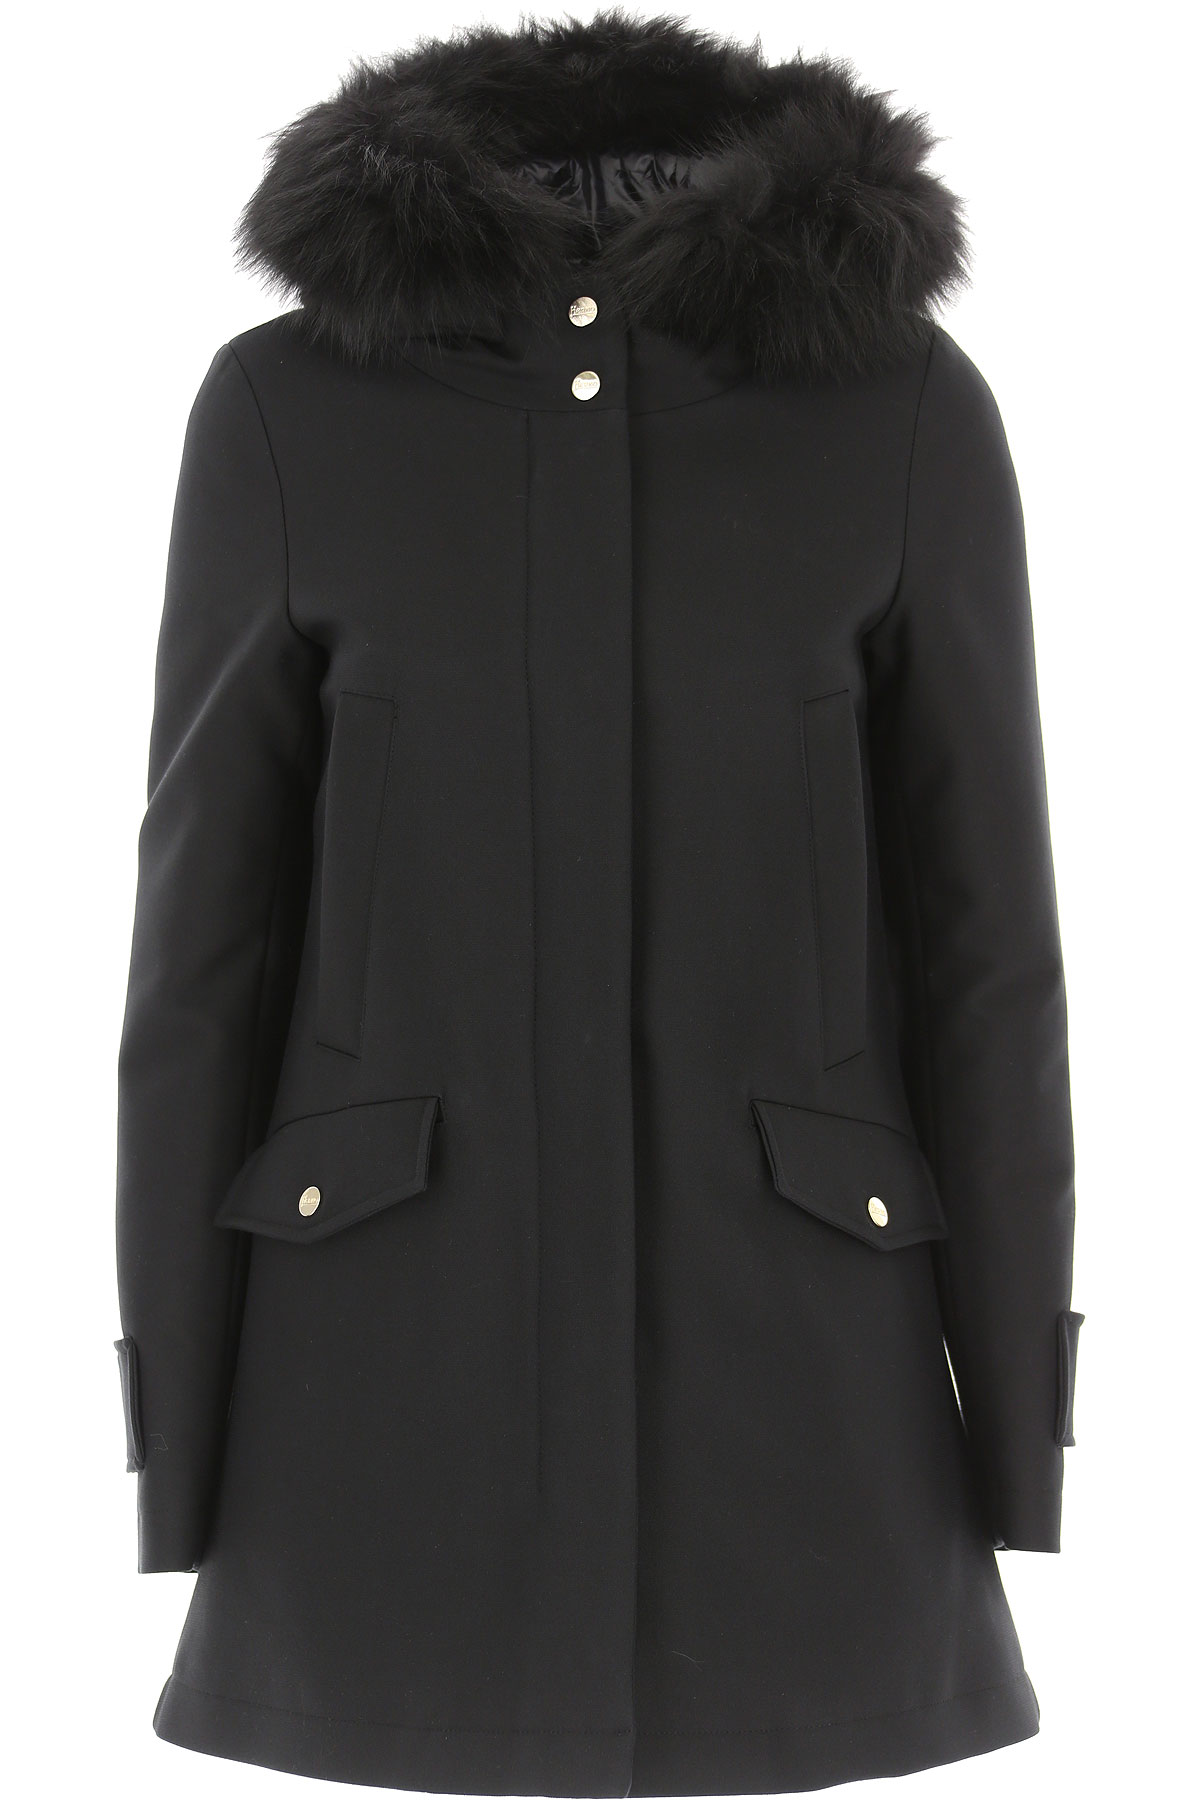 Herno Down Jacket for Women, Puffer Ski Jacket On Sale, Black, Down, 2019, 10 14 4 6 8